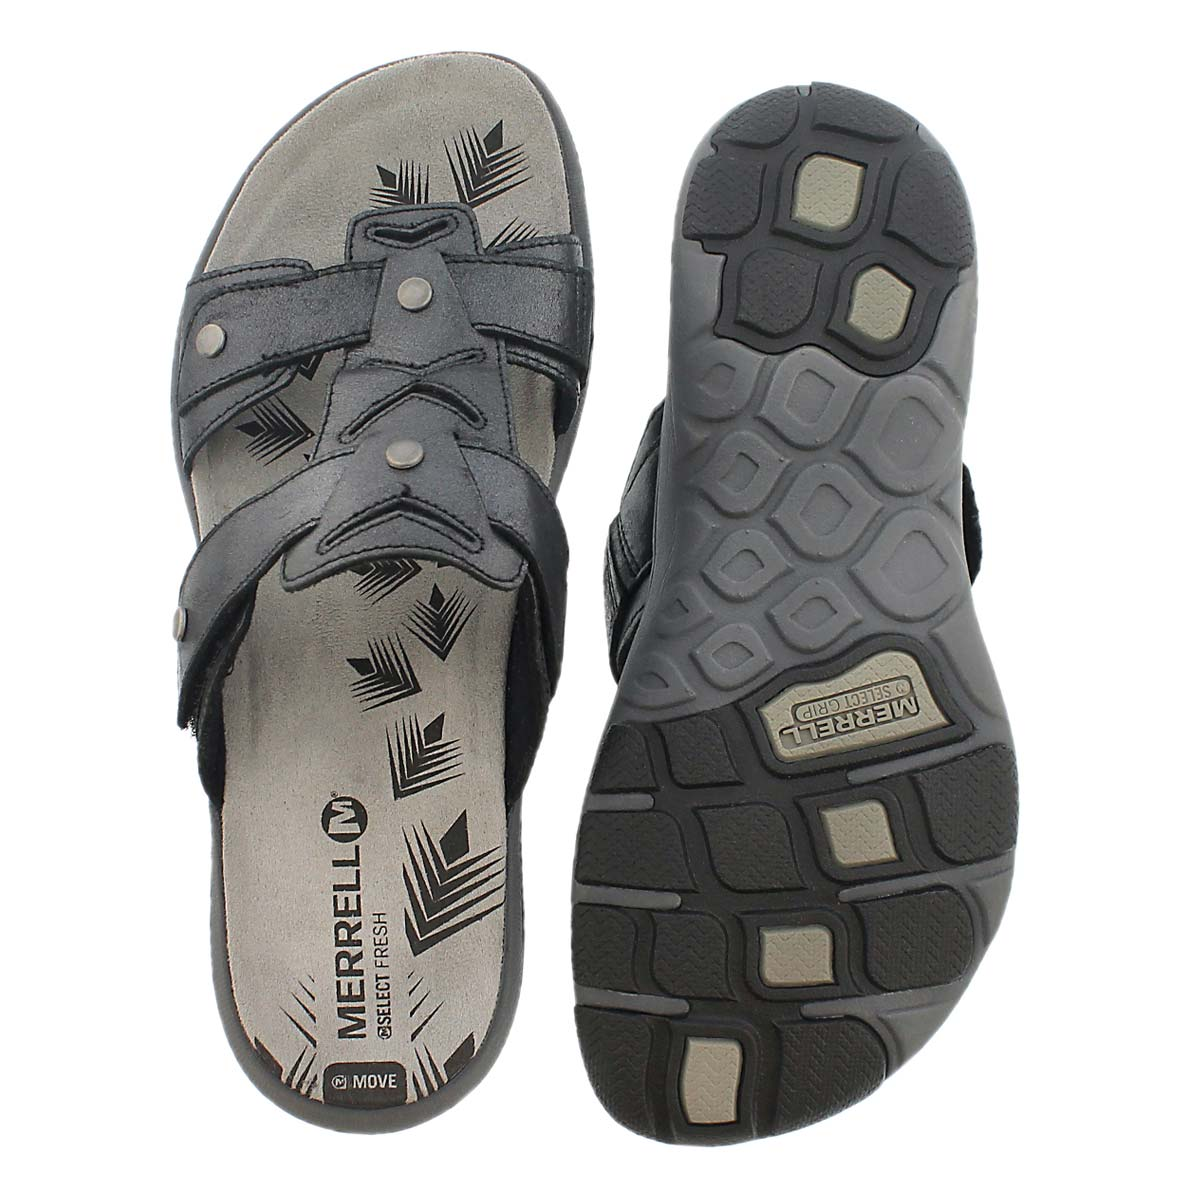 Lds Adhera Slide blk casual slide sandal